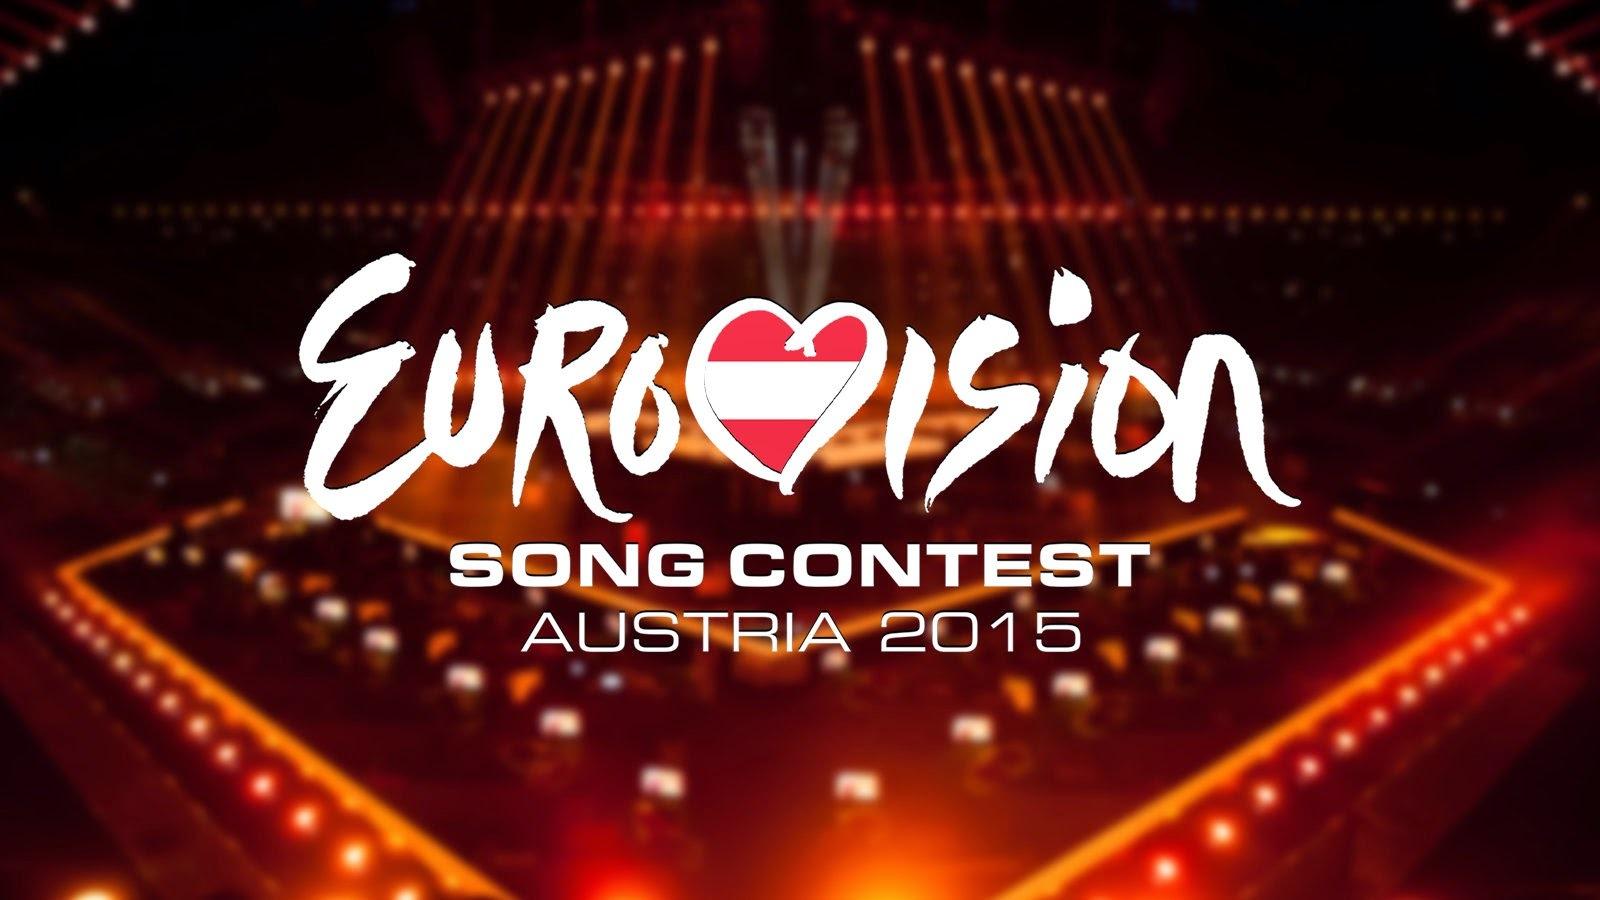 Eurovision coverage kicks off on BBC1 at 8pm tonight